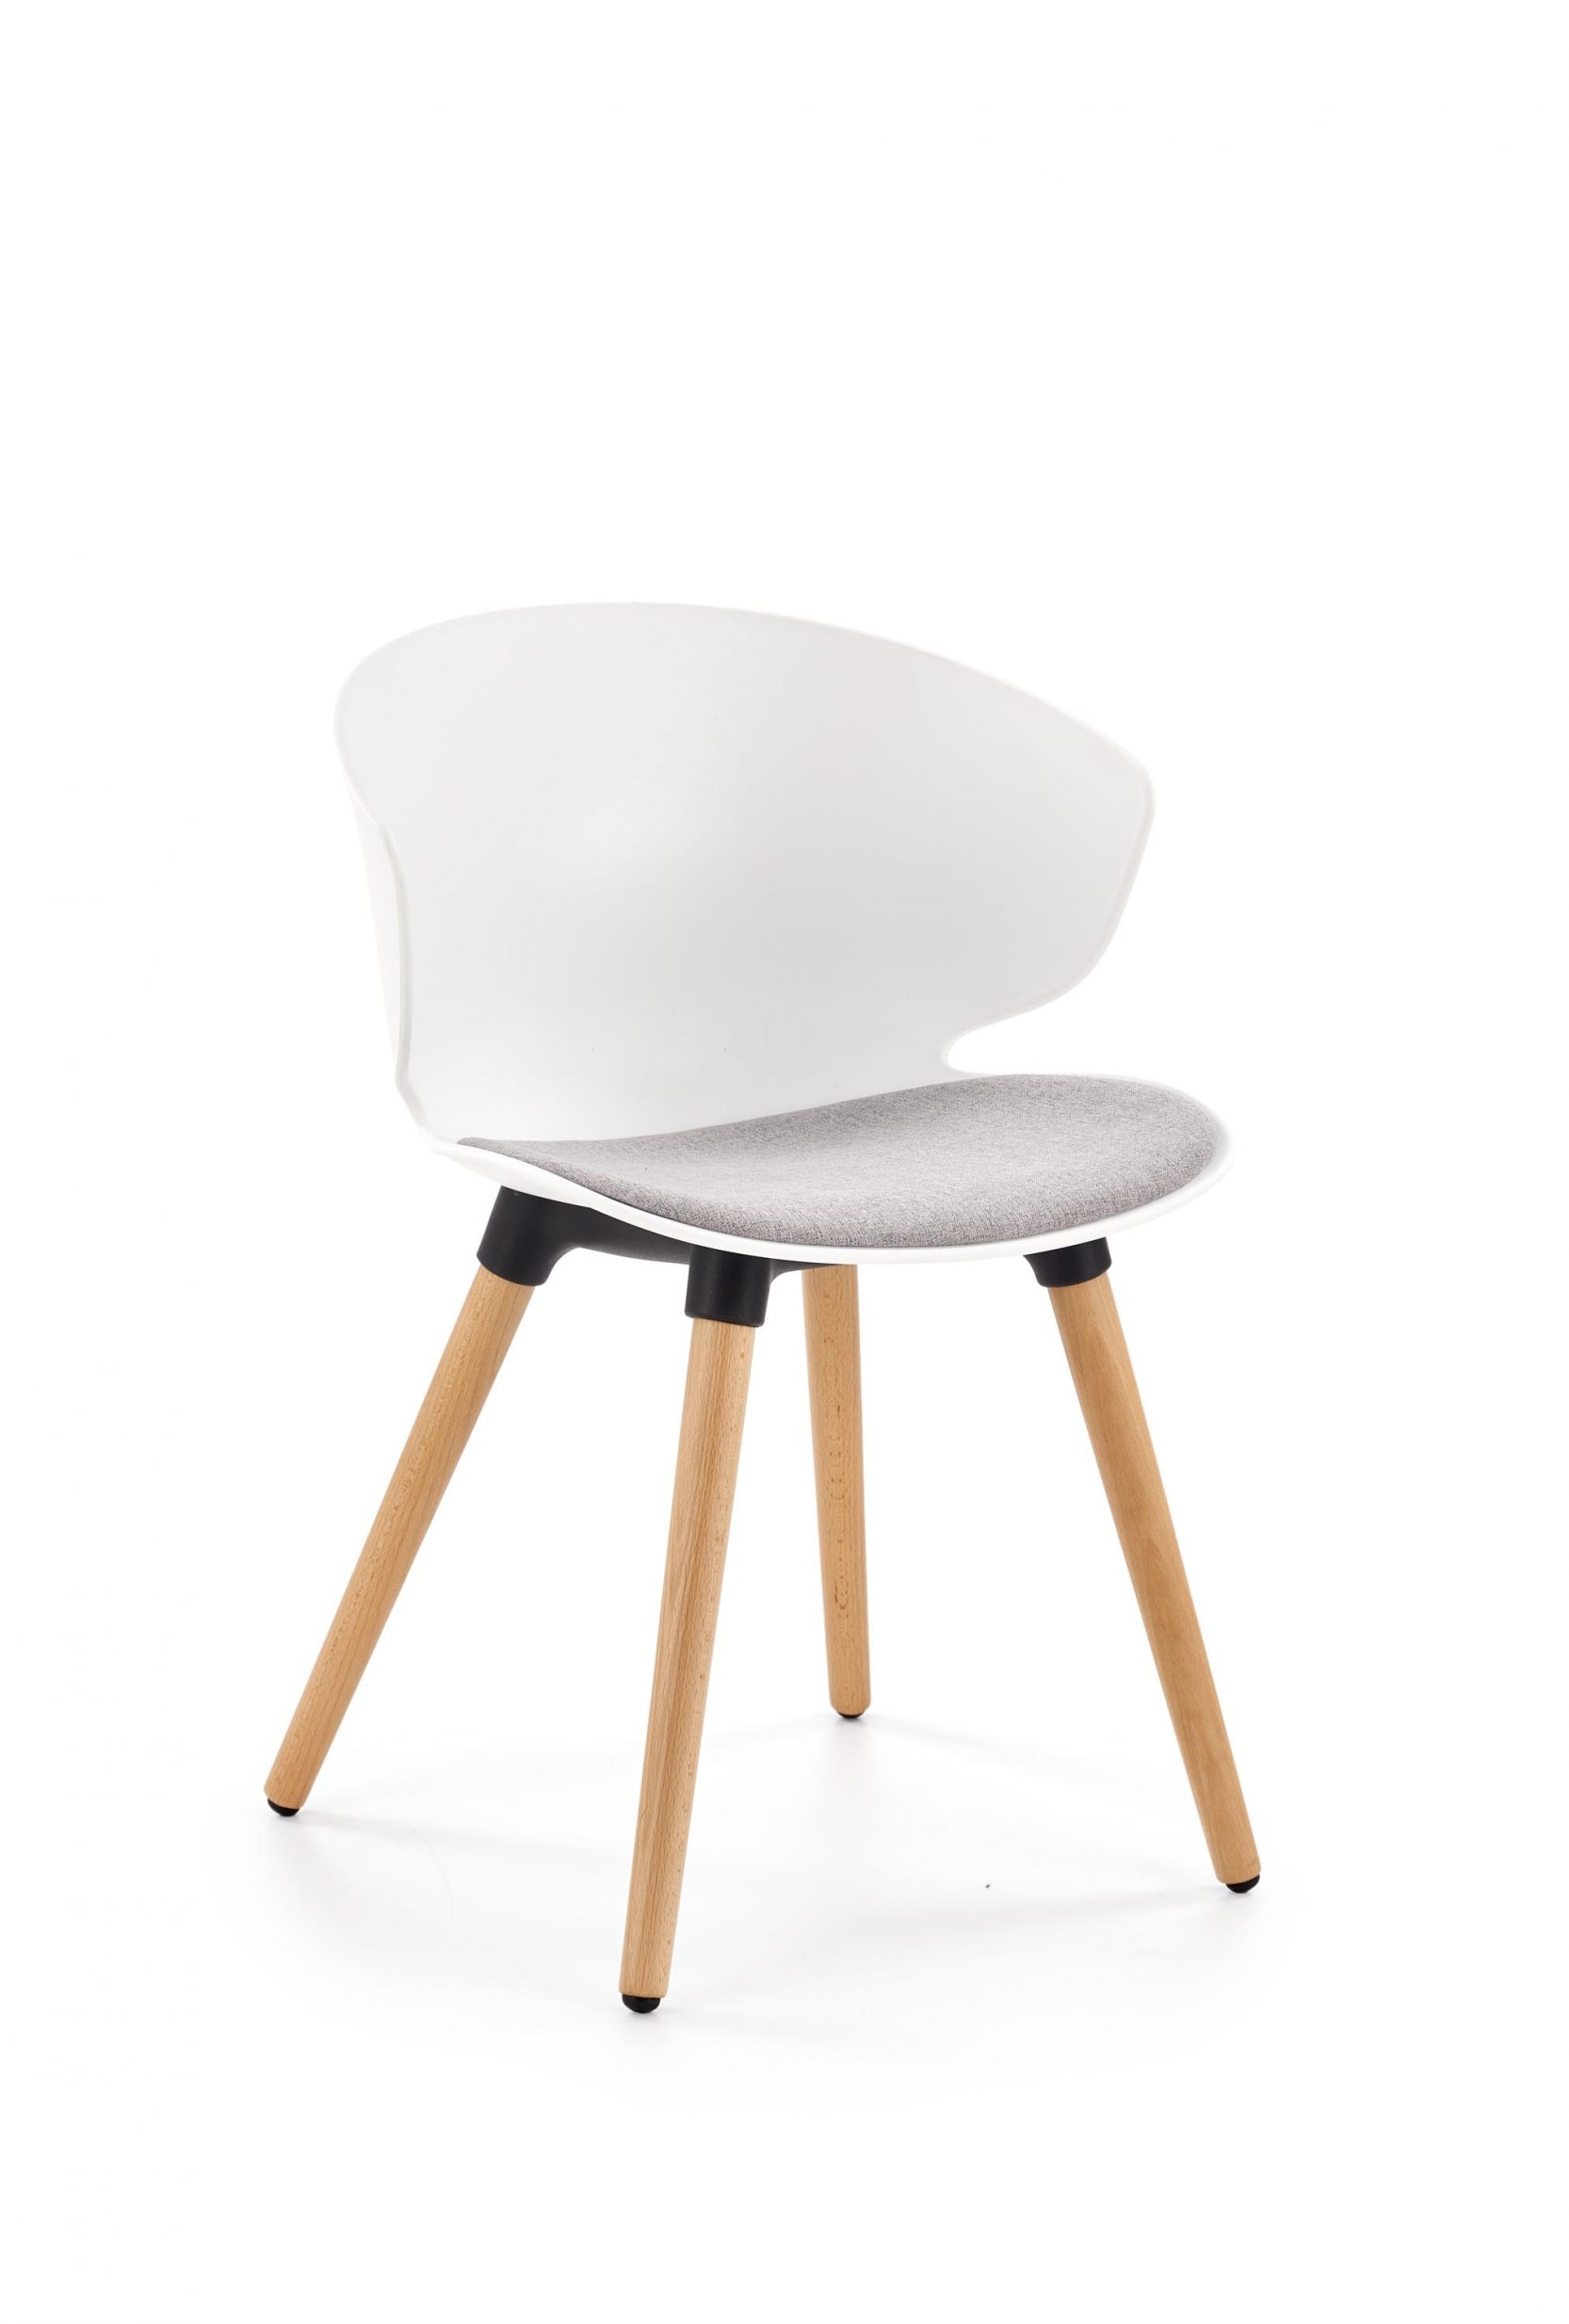 Scaun din plastic, cu sezut tapitat cu stofa si picioare din lemn K324 Alb / Gri / Natural, l55xA52xH75 cm imagine